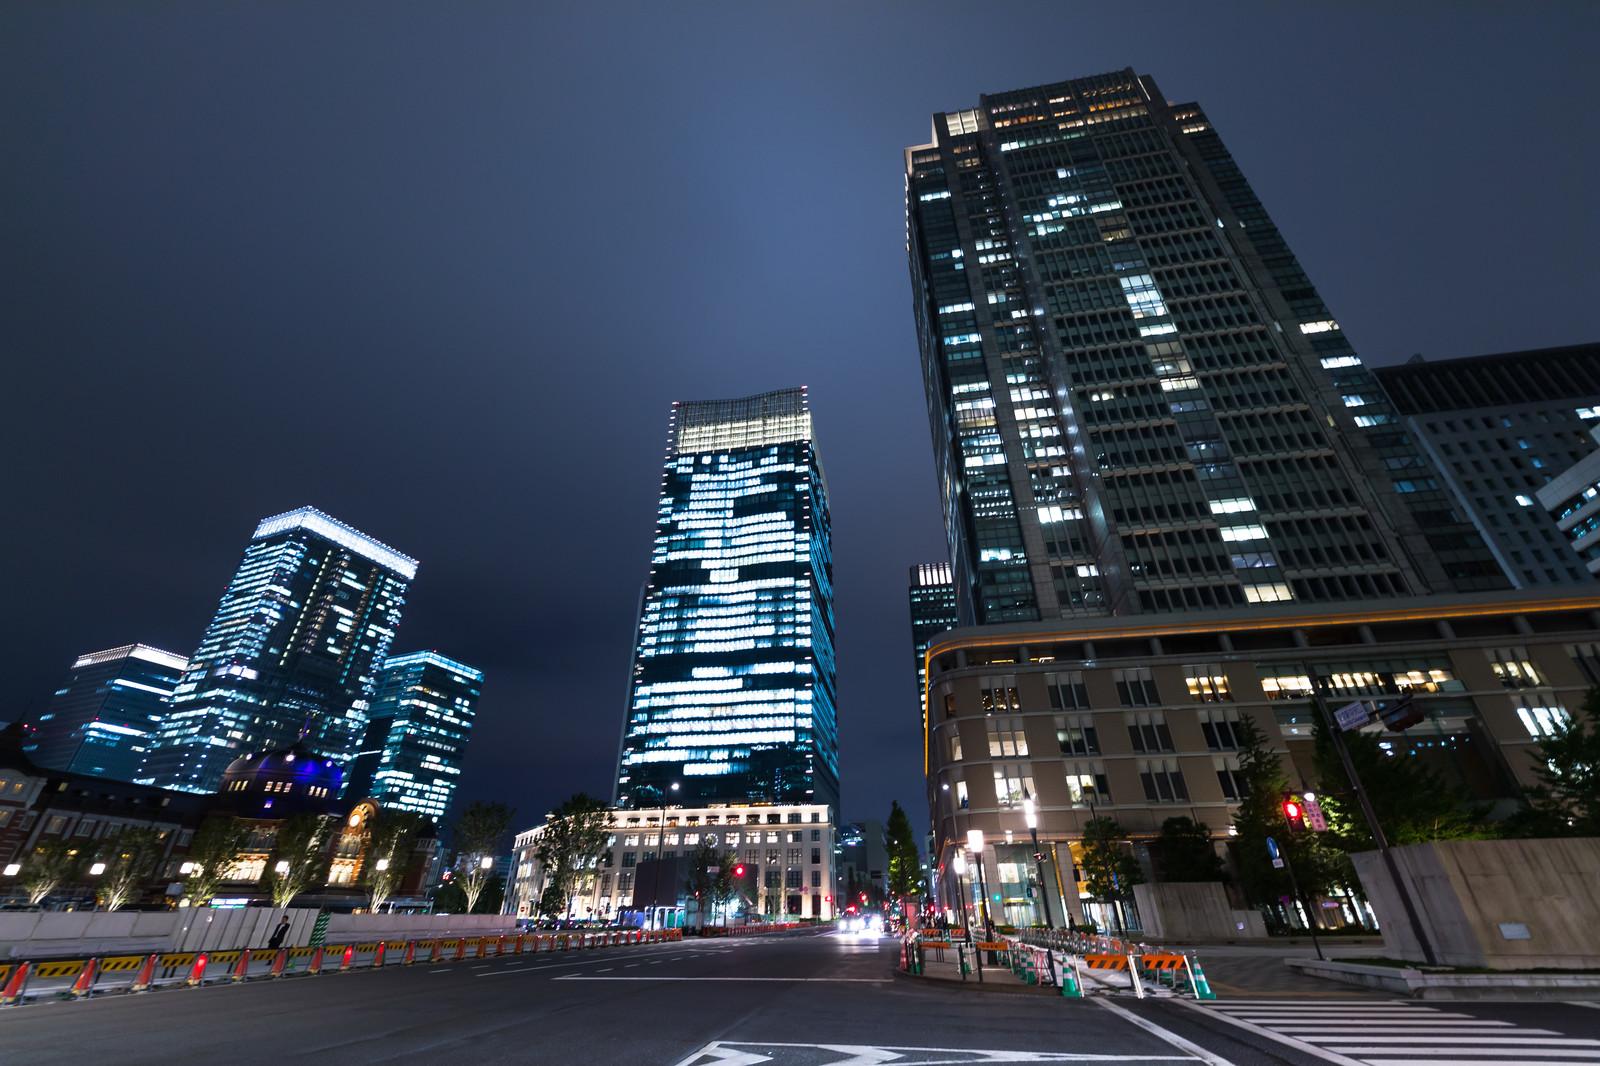 日本の格差社会